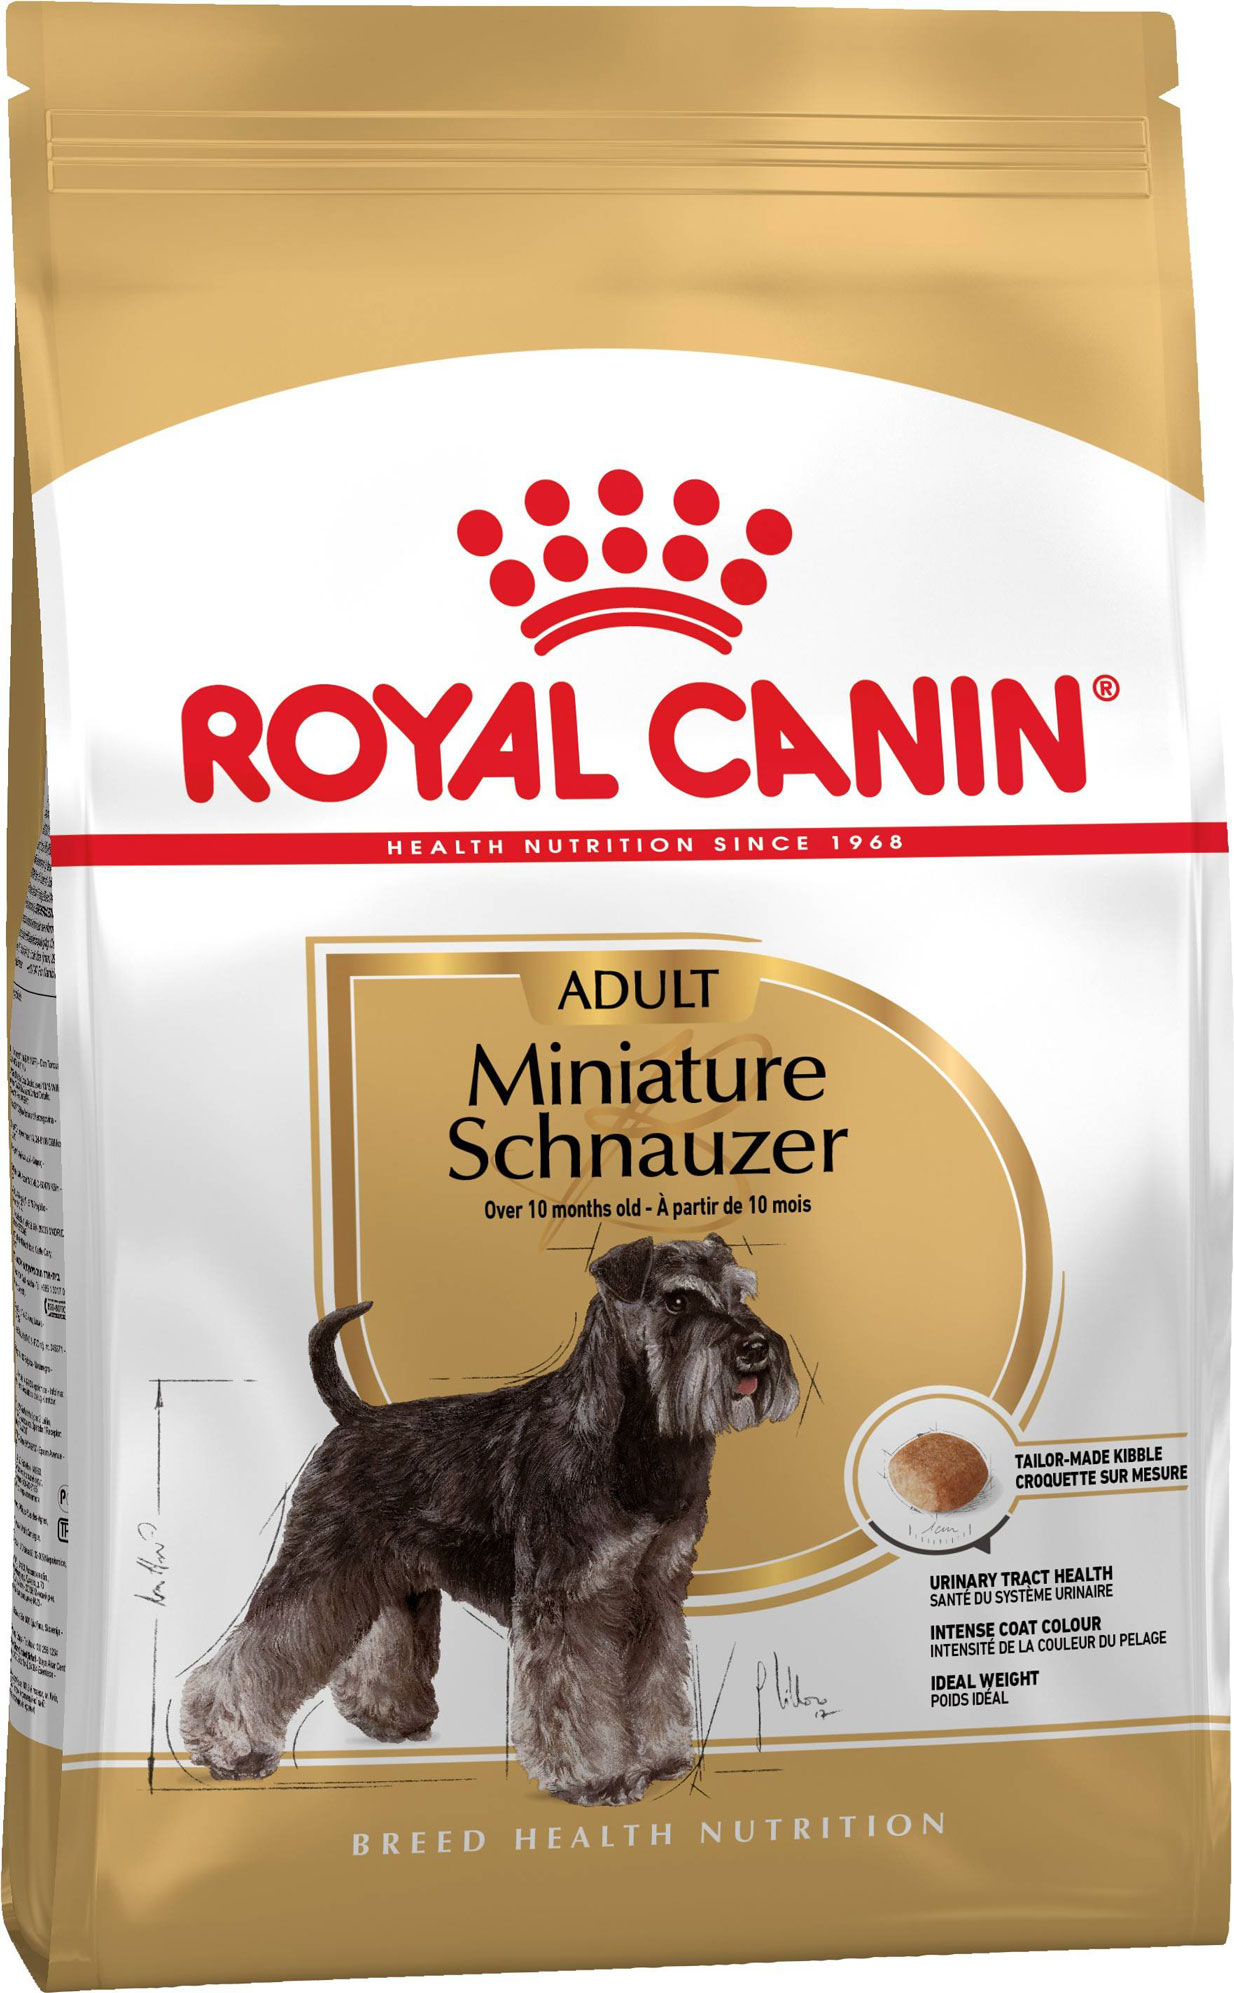 ROYAL CANIN MINIATURE SCHNAUZER ADULT – сухий корм для дорослих собак породи цвегшнауцер